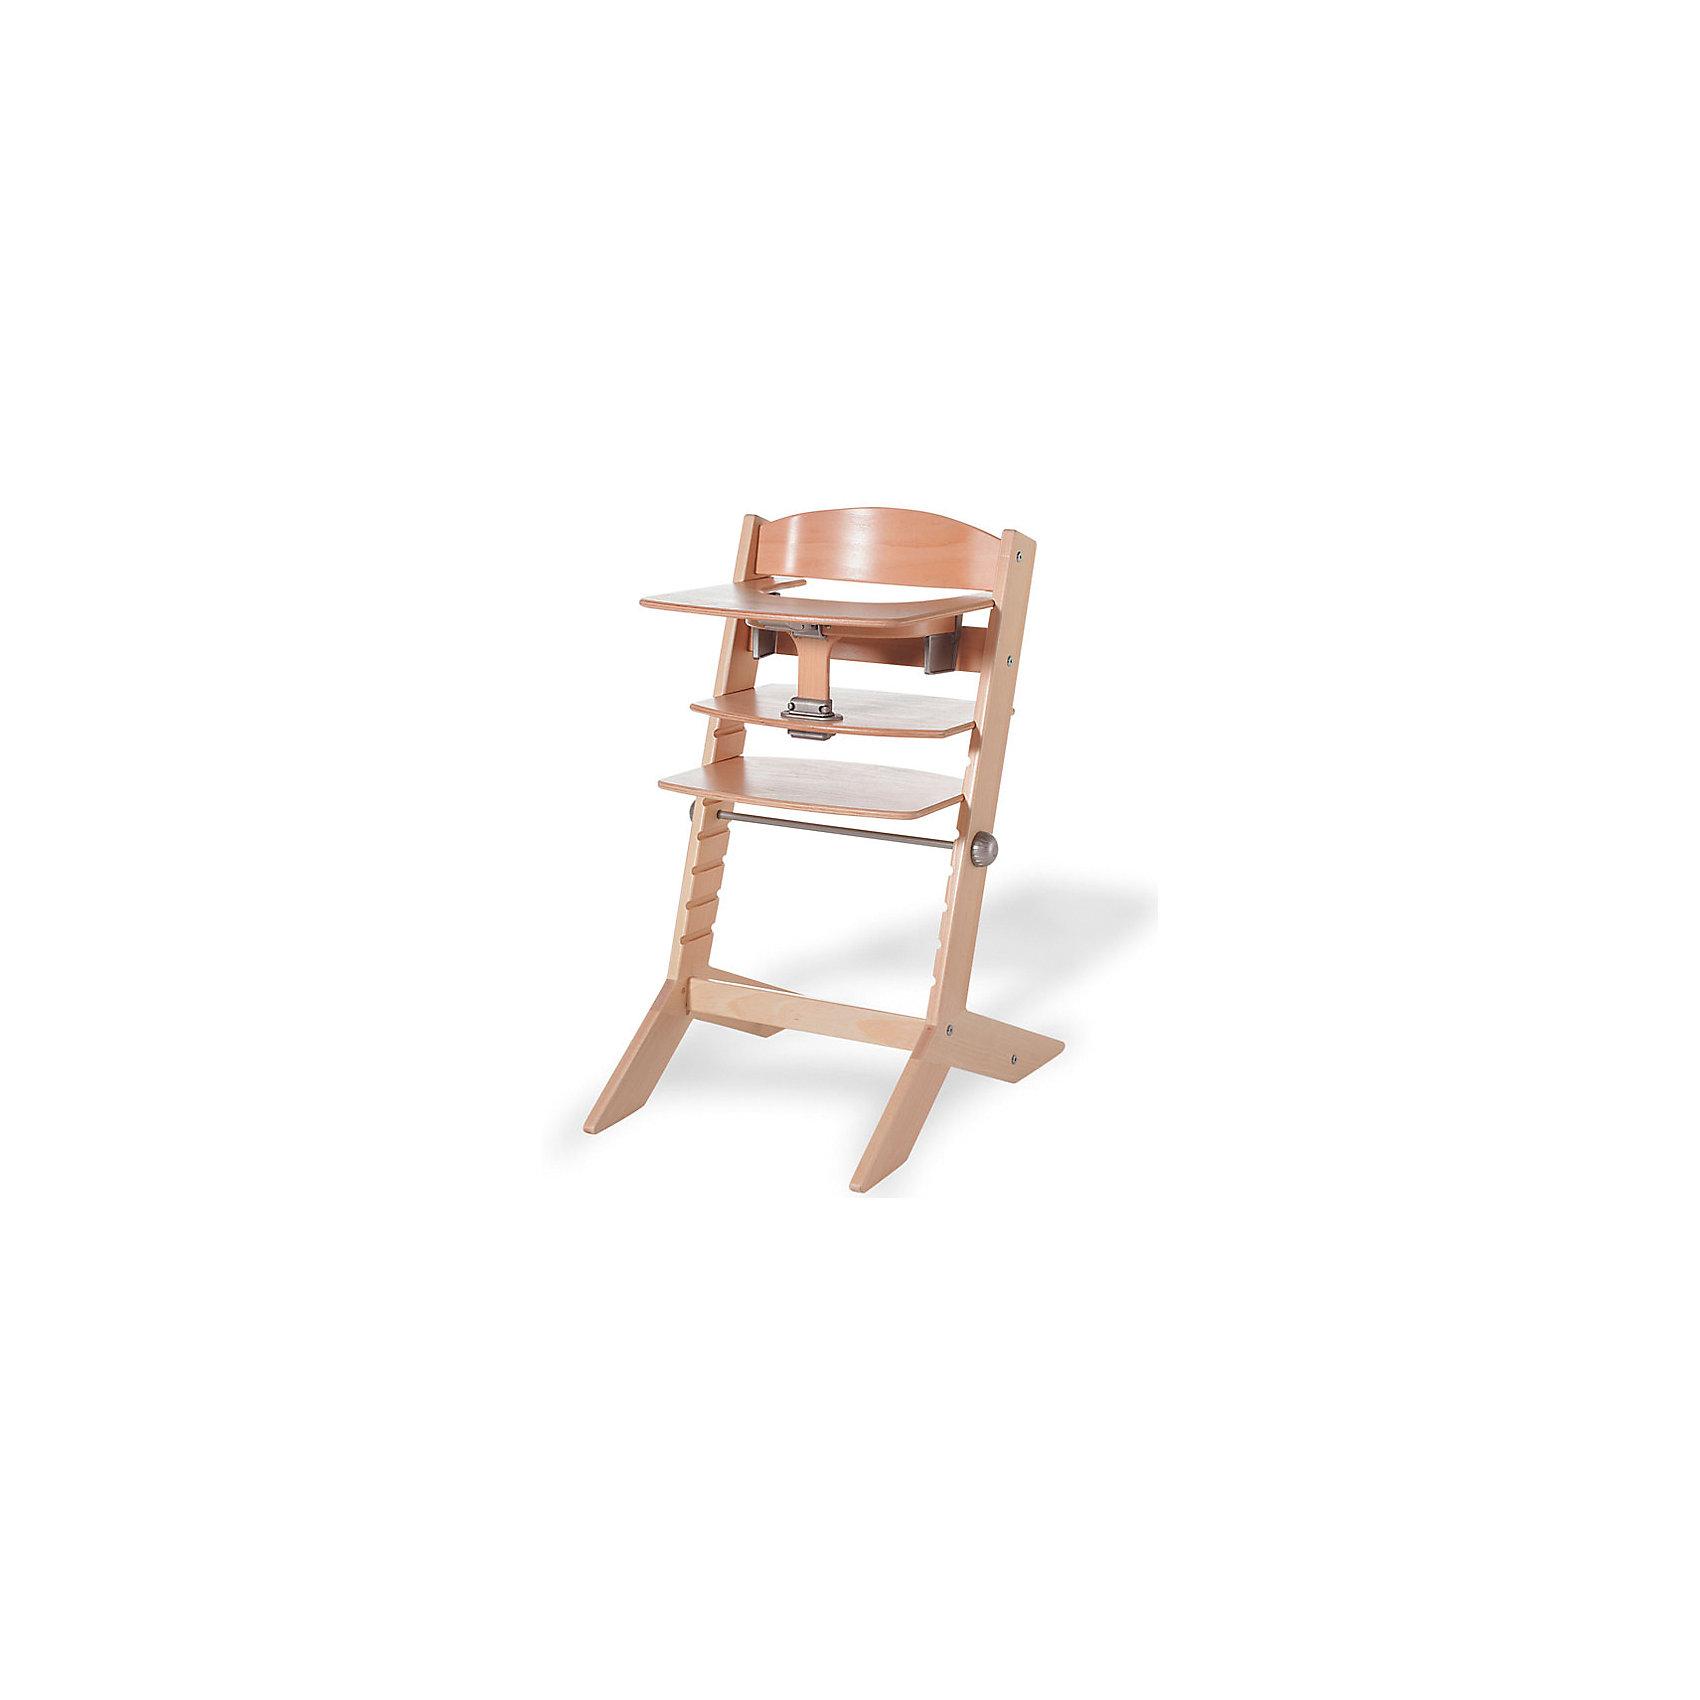 Geuther Стульчик для кормления Syt, Geuther, натуральный столик geuther столик для стульчика geuther syt